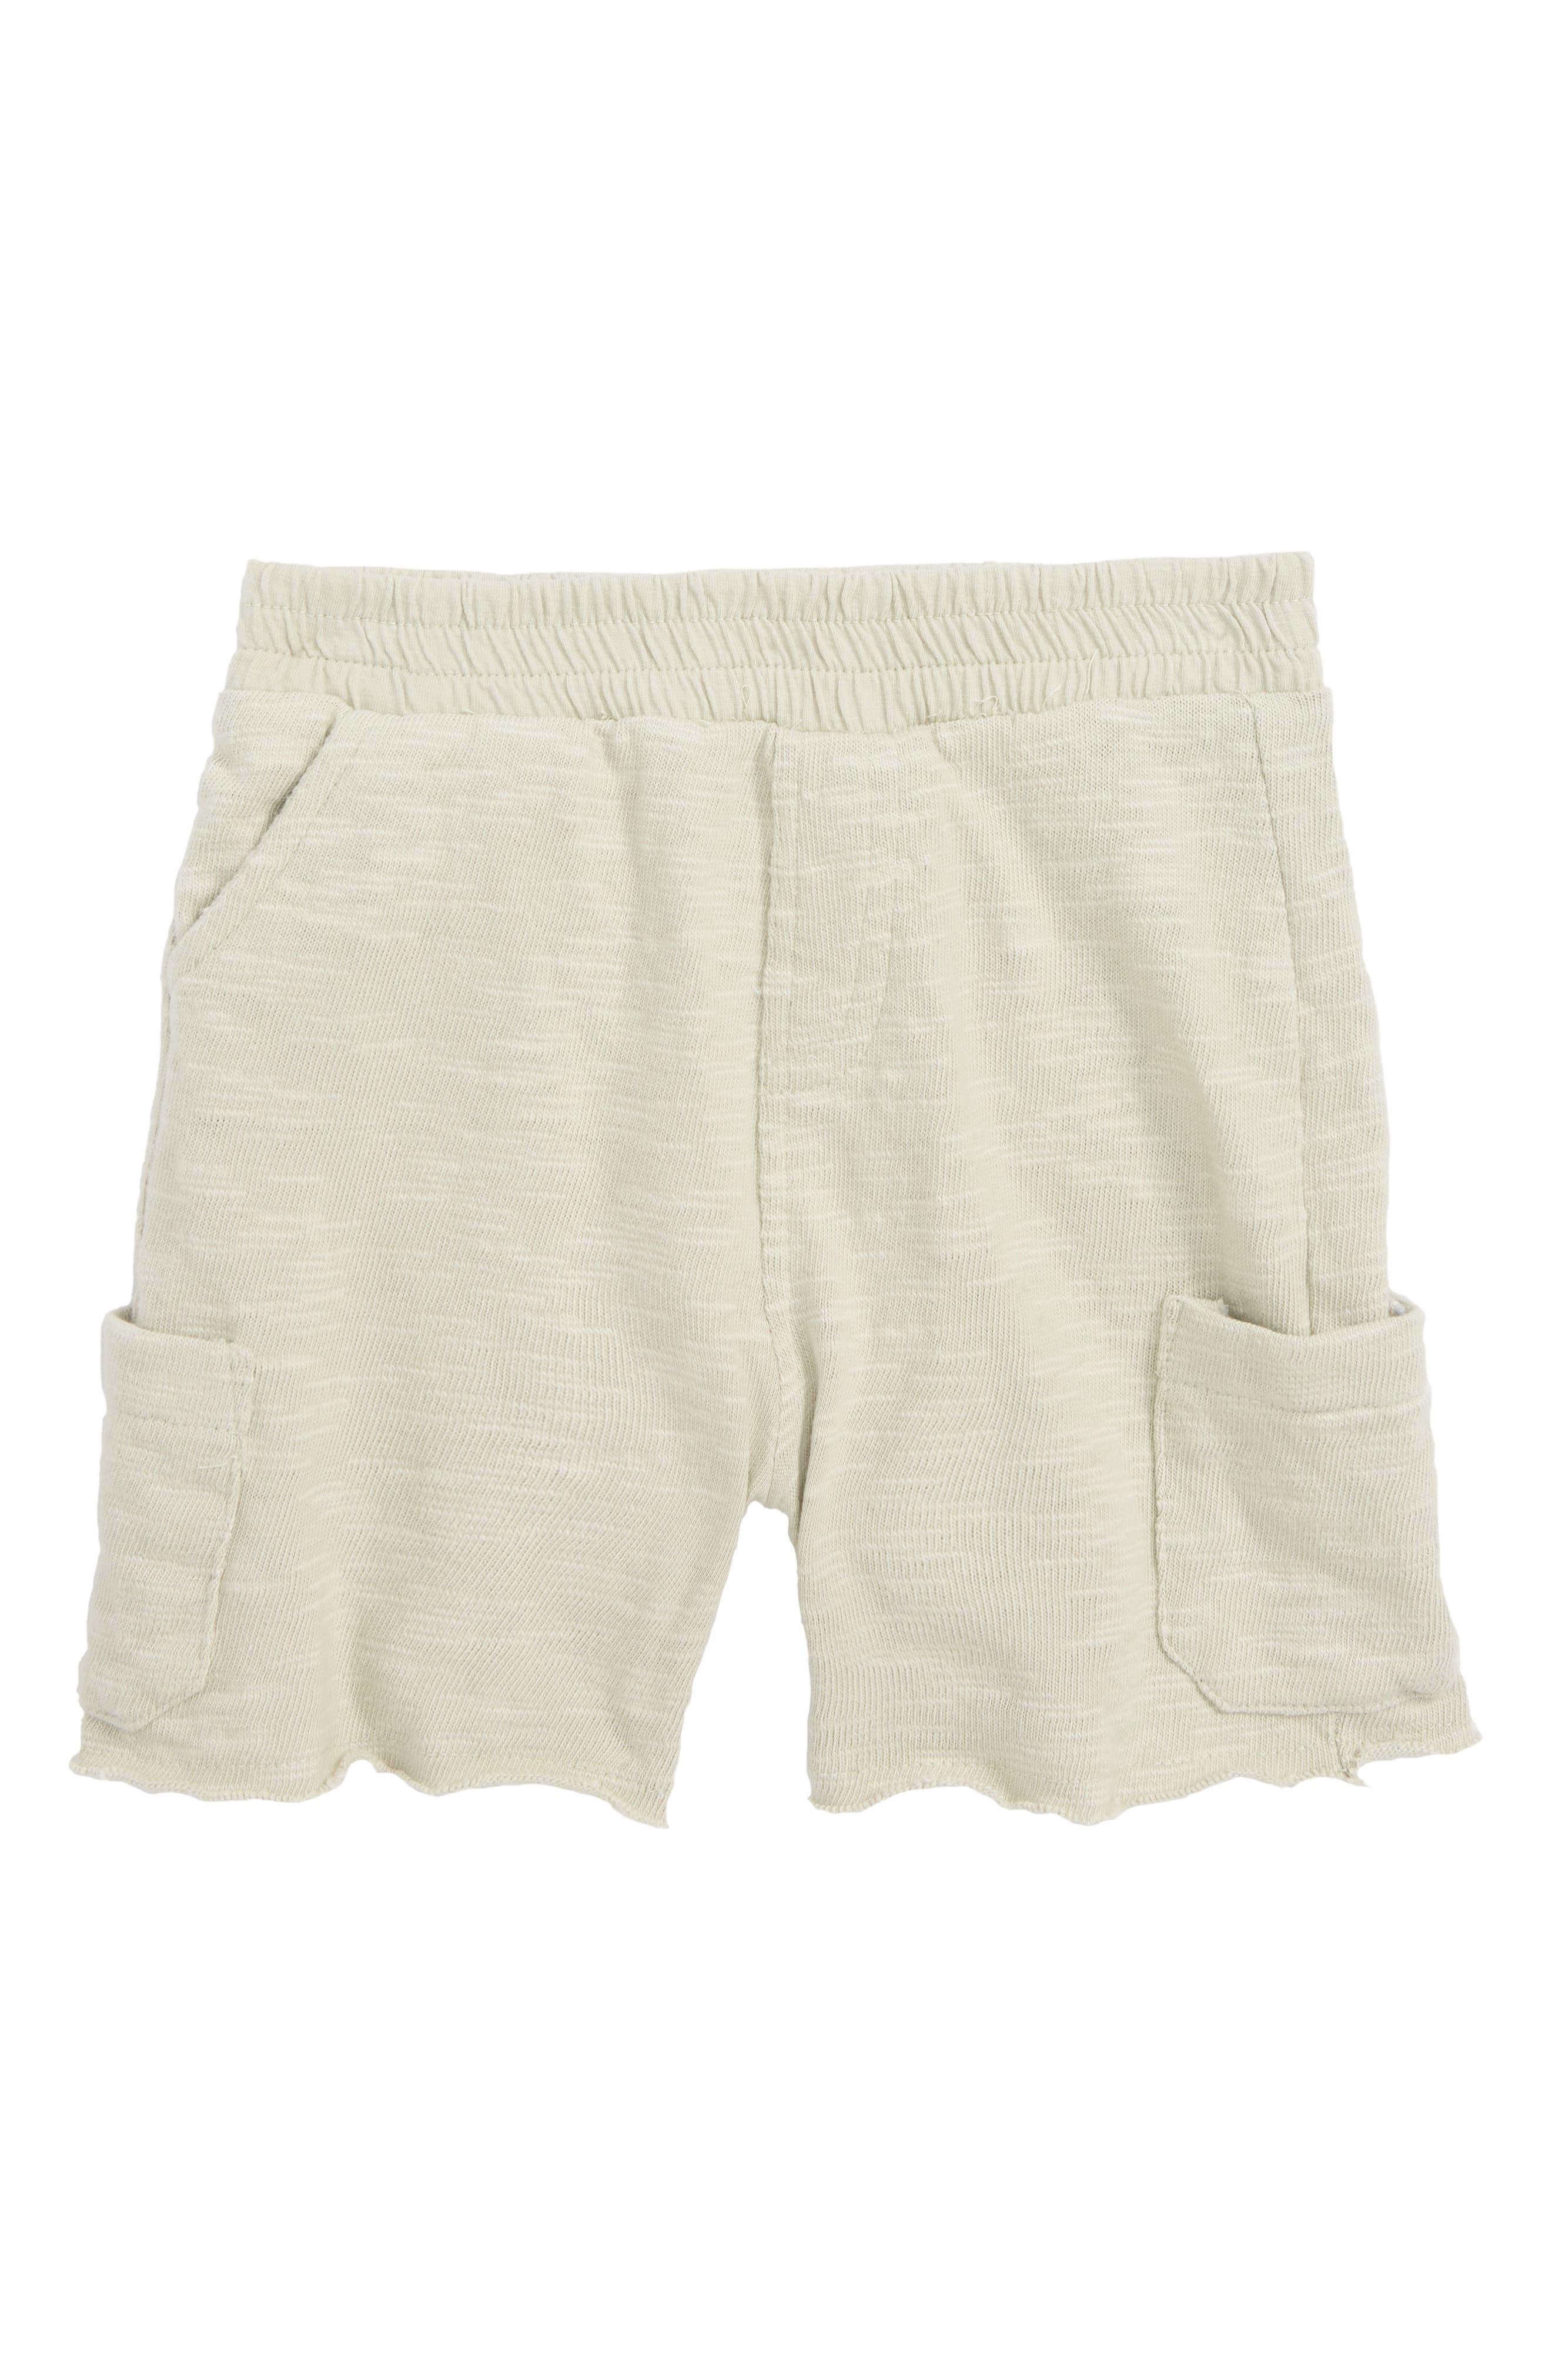 Asher Knit Cargo Shorts,                         Main,                         color, Grey